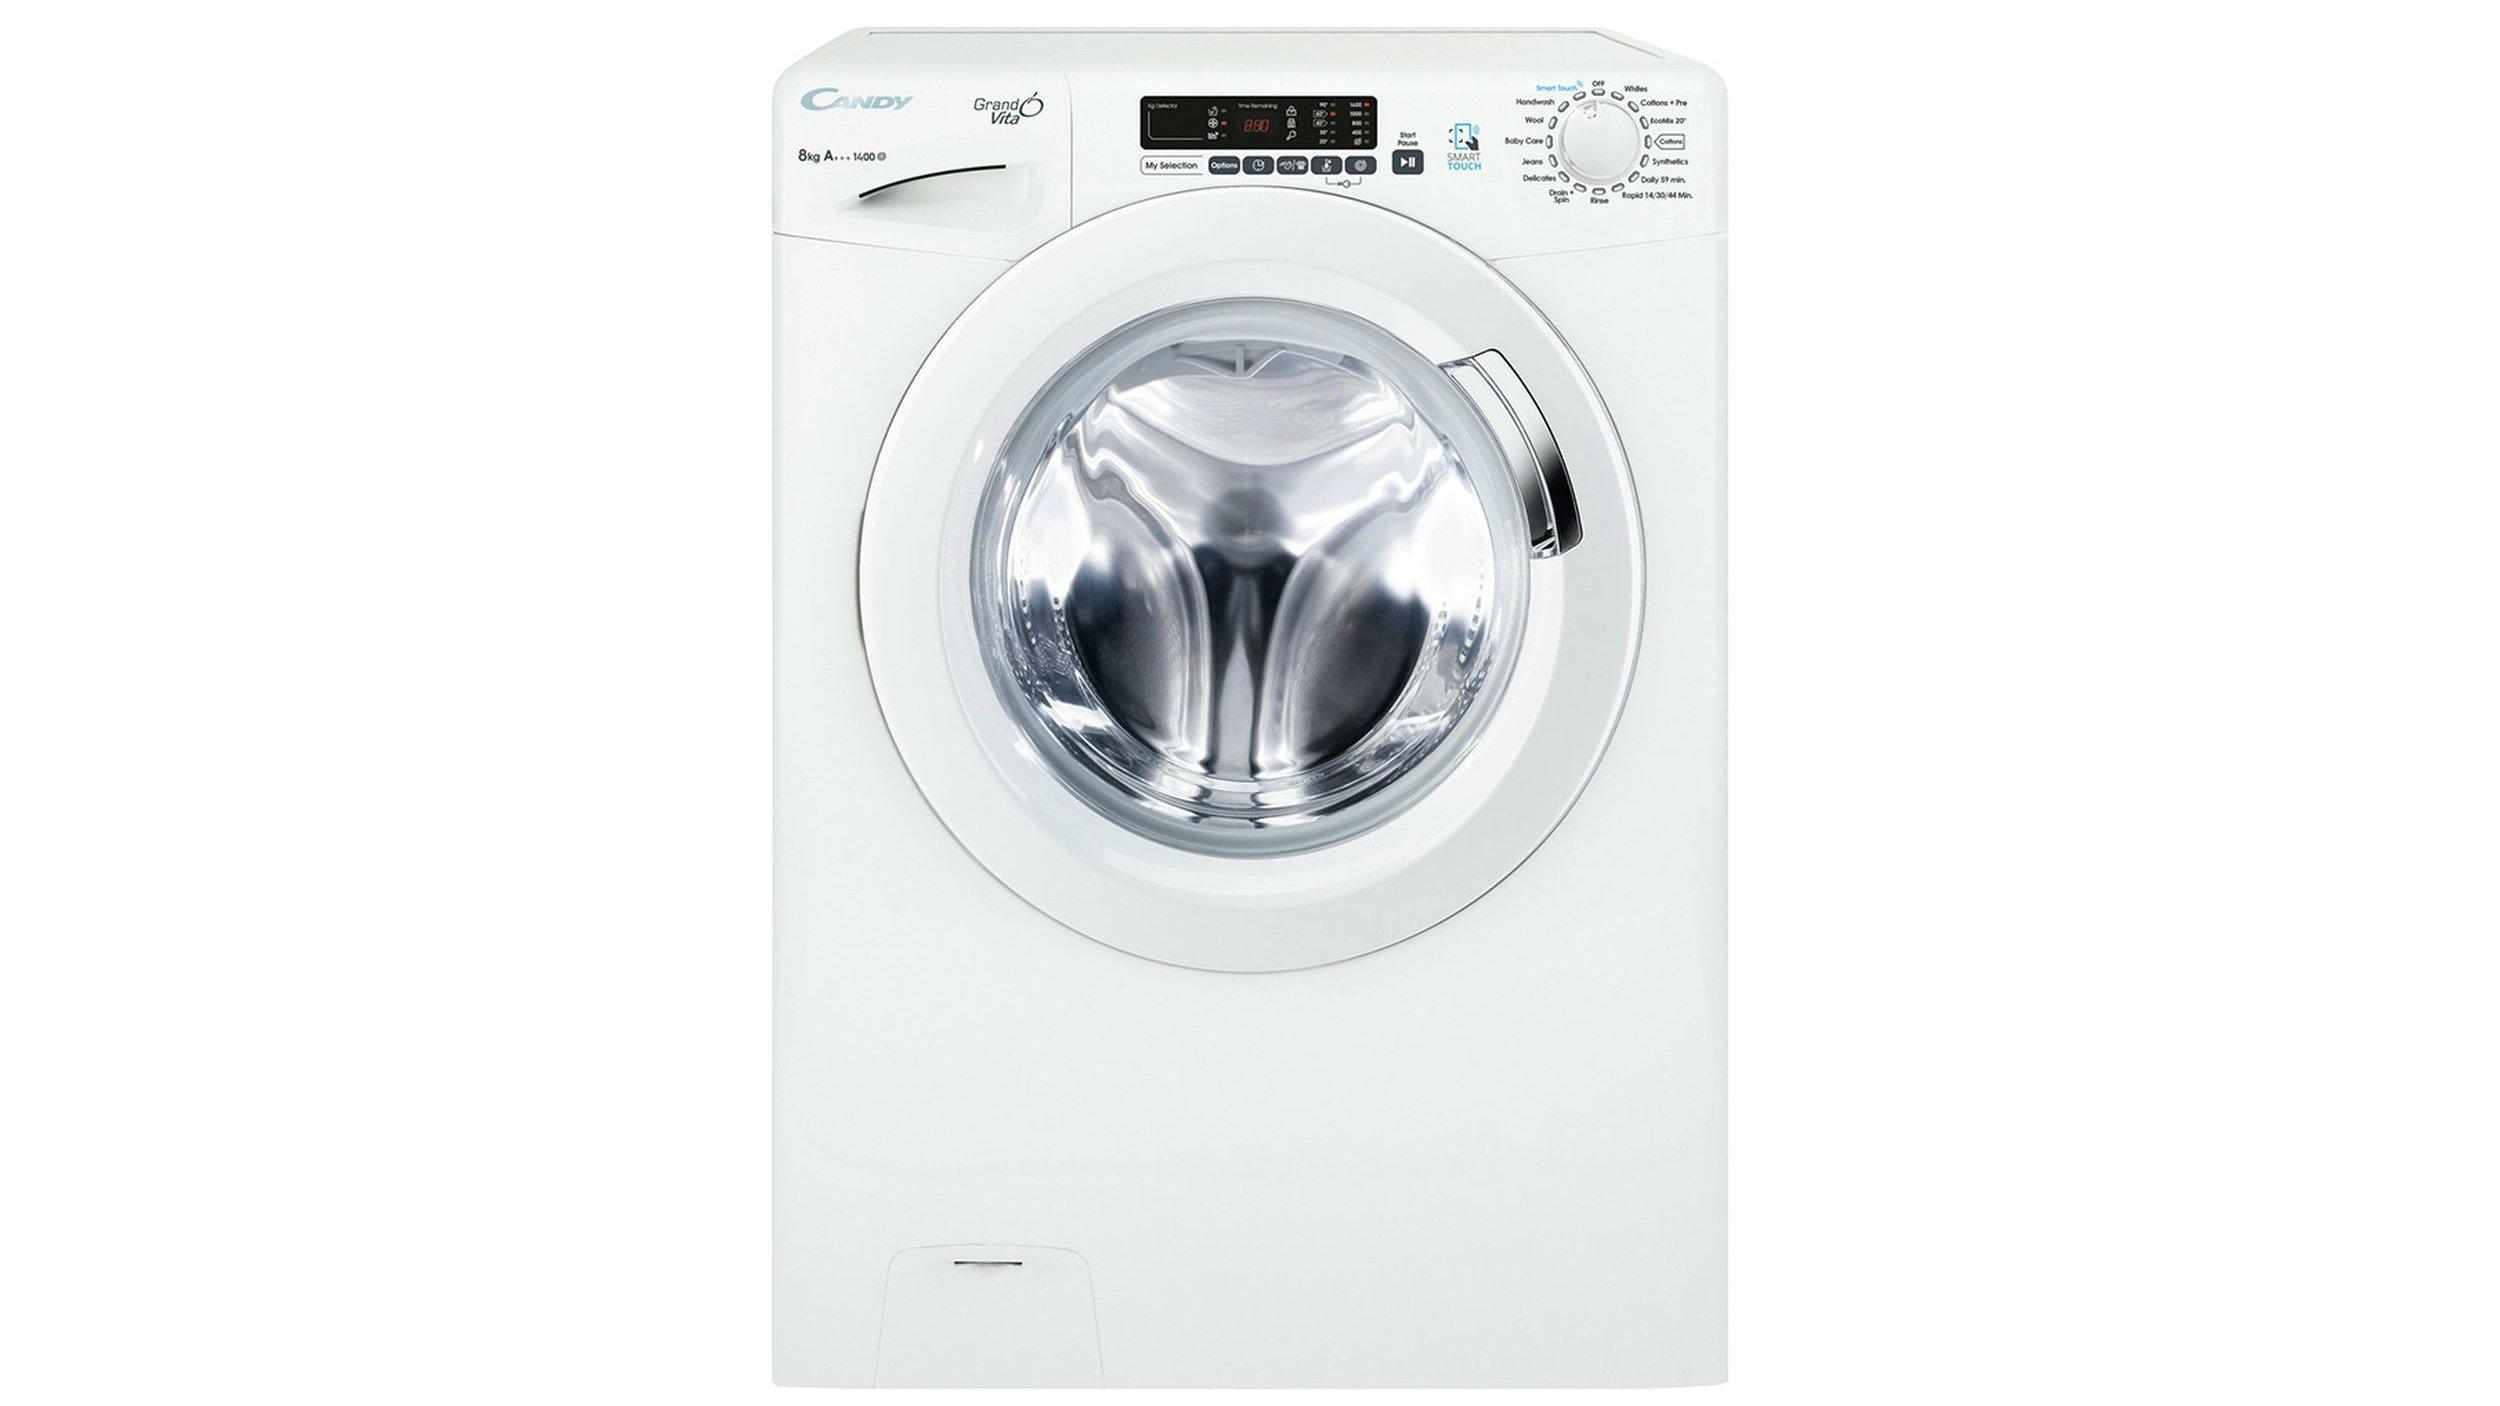 best washing machine deals 2017 huge discounts on washing. Black Bedroom Furniture Sets. Home Design Ideas